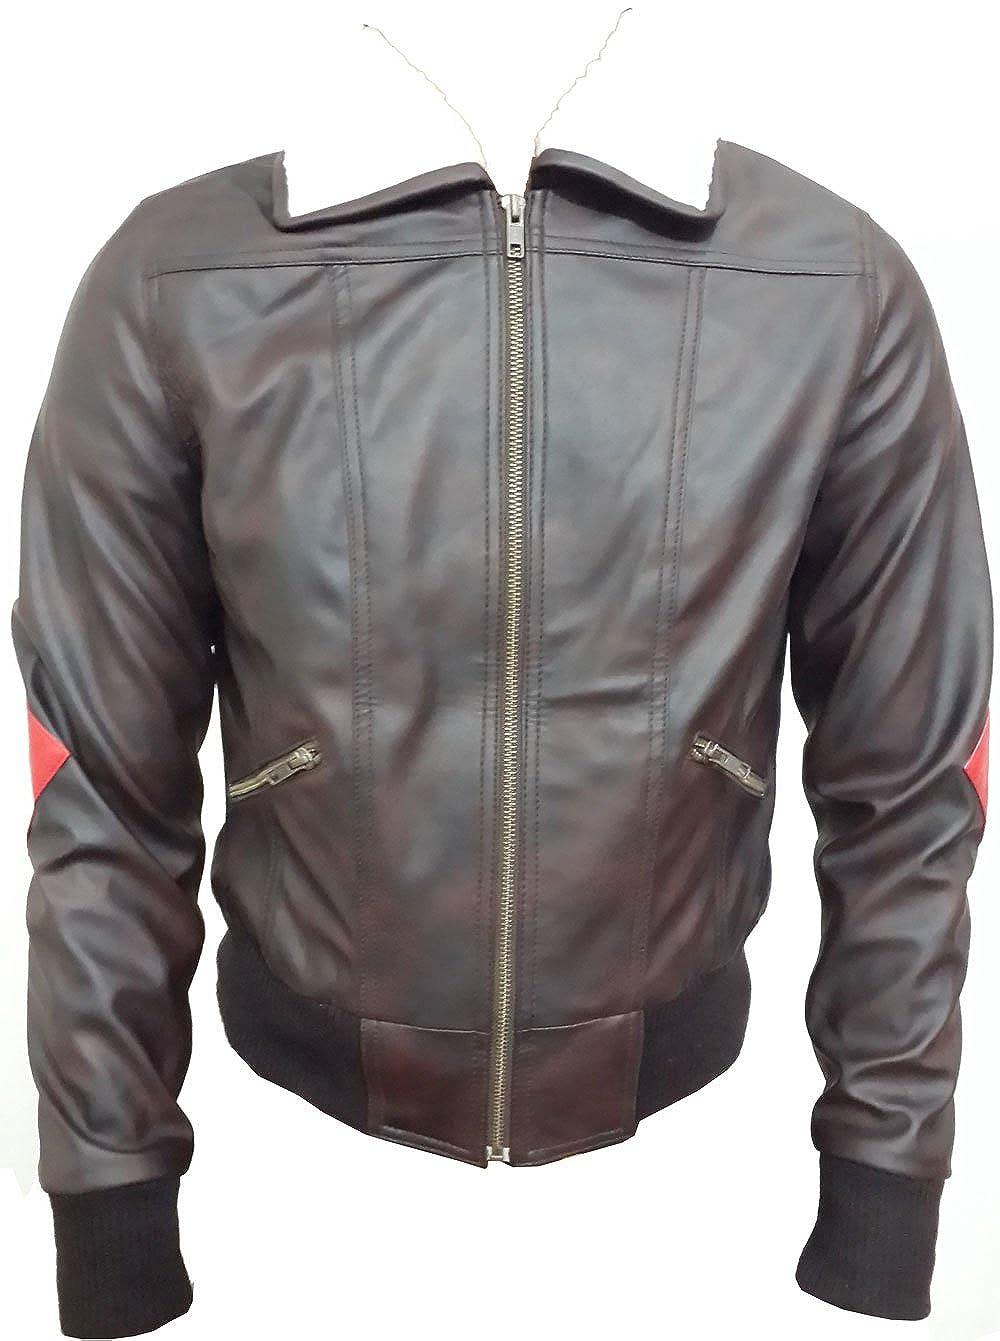 Fashion Xone Womens Celebrity Costume Faux Leather Jacket Sale Offer